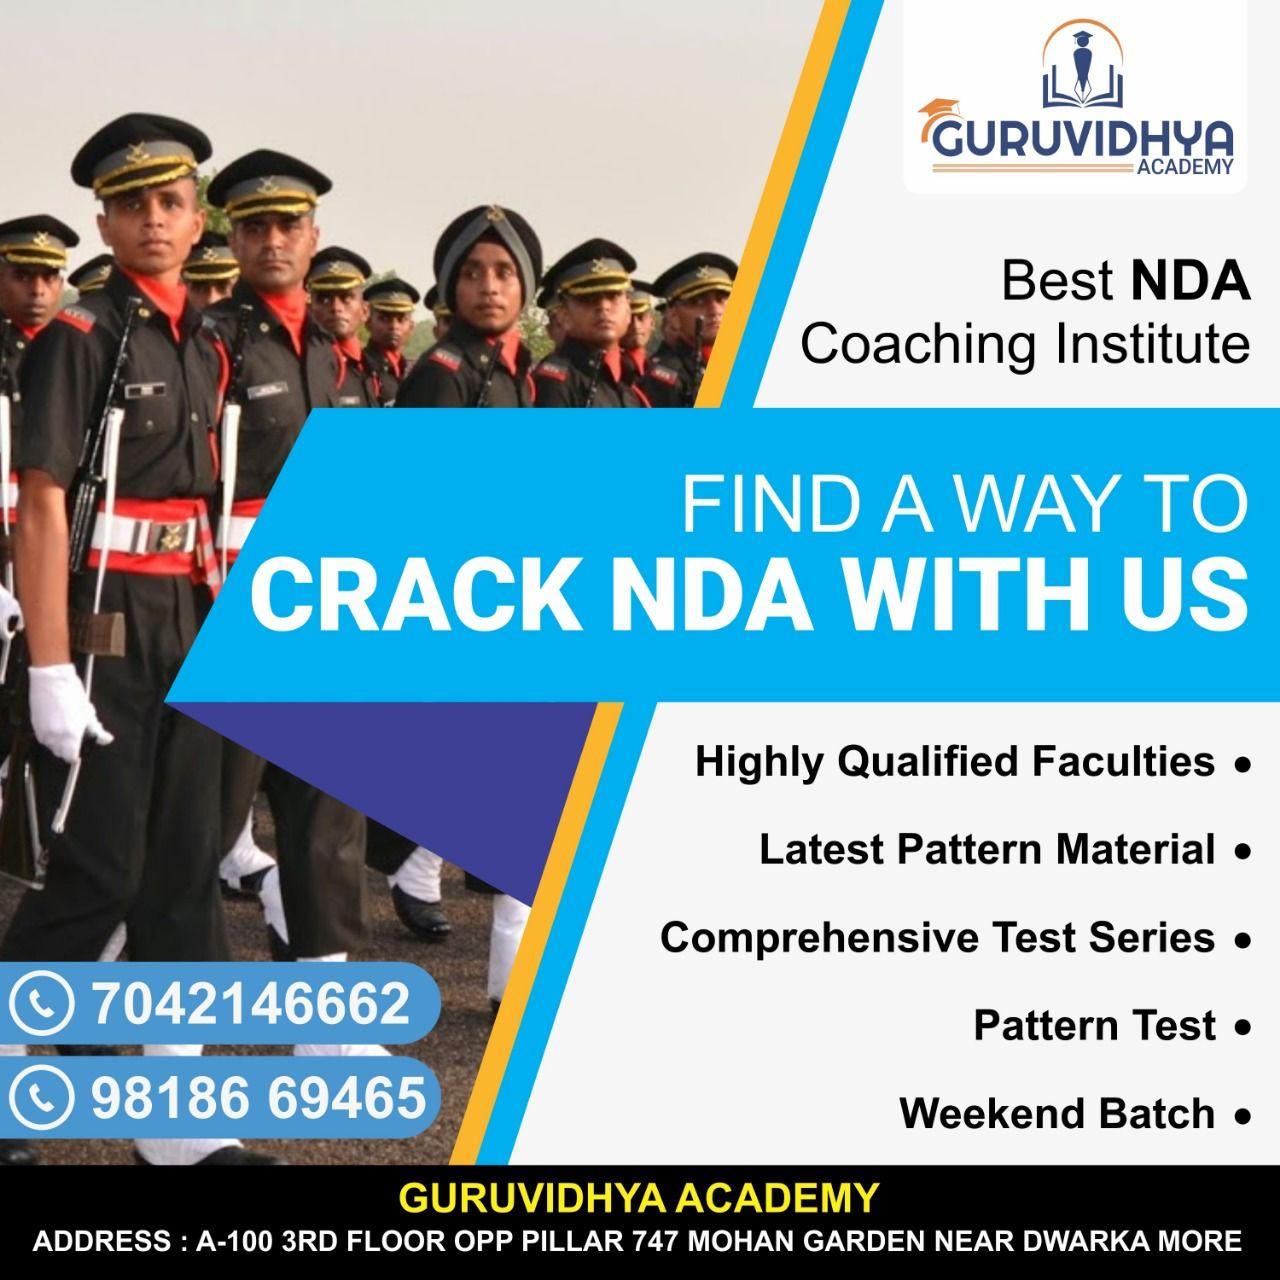 Pin by GuruVidhya Academy on